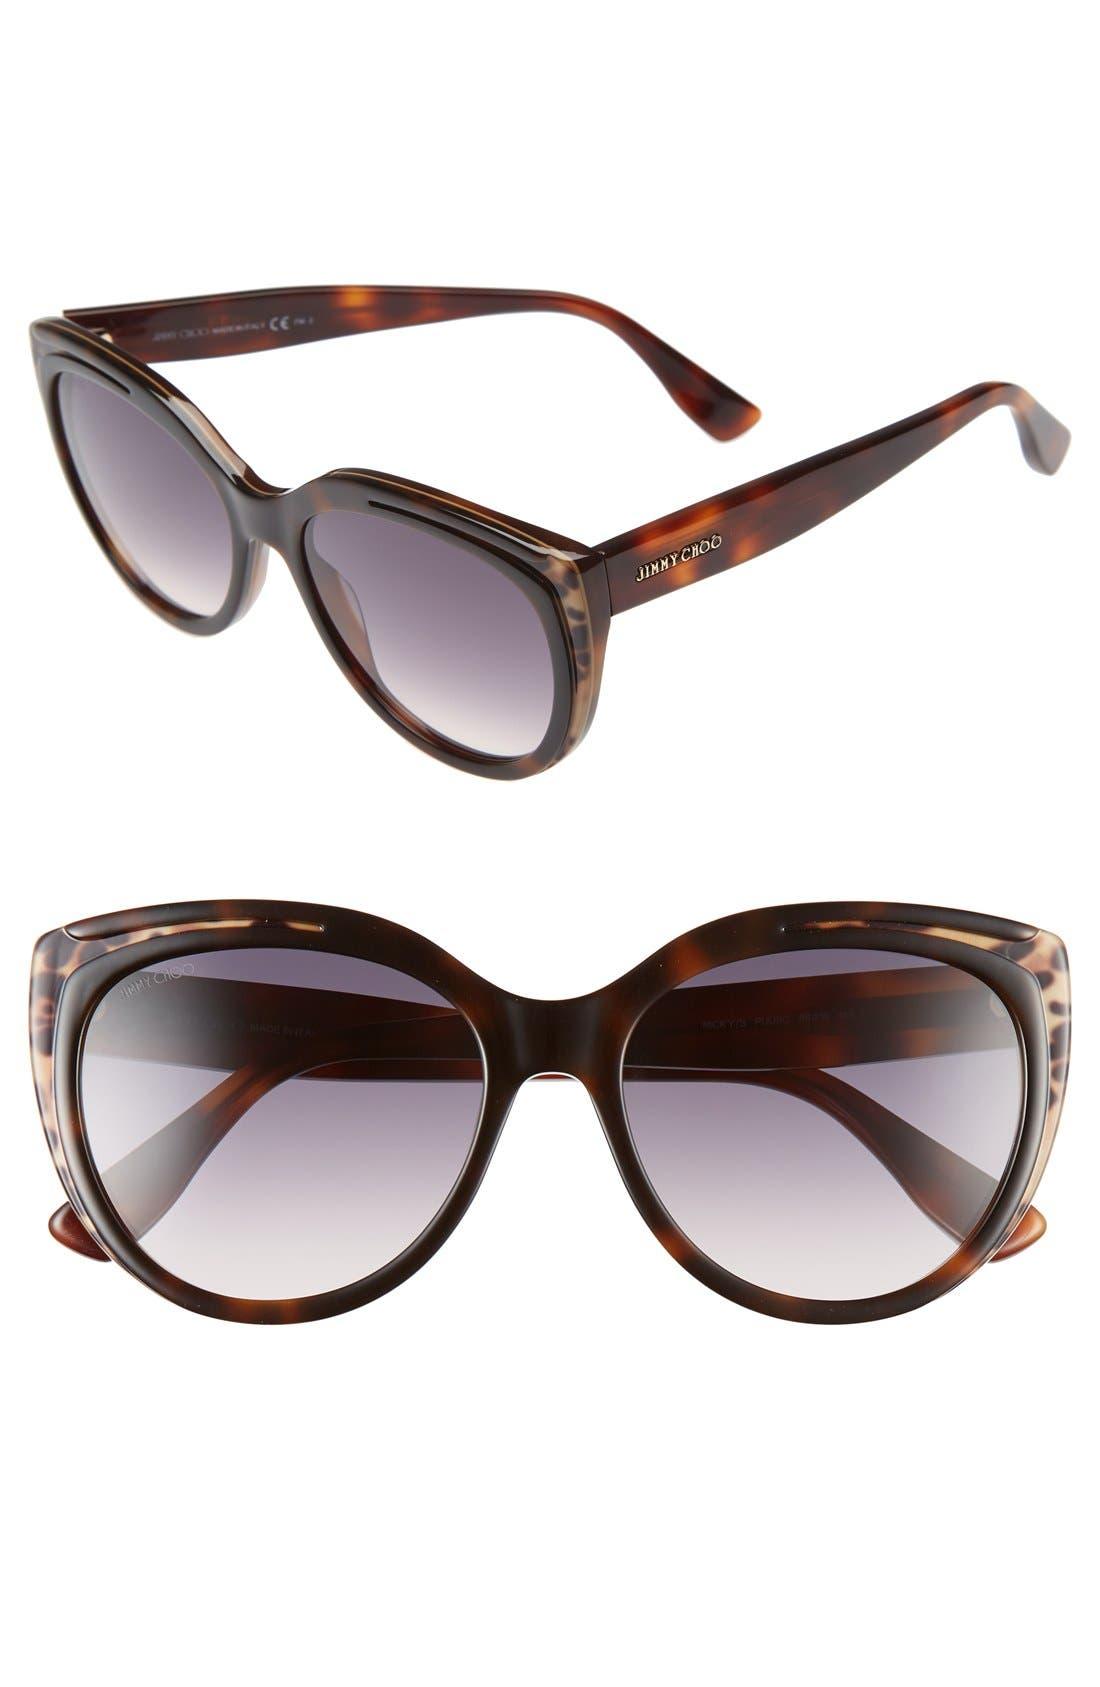 Jimmy Choo 'Nicky' 56mm Cat Eye Sunglasses